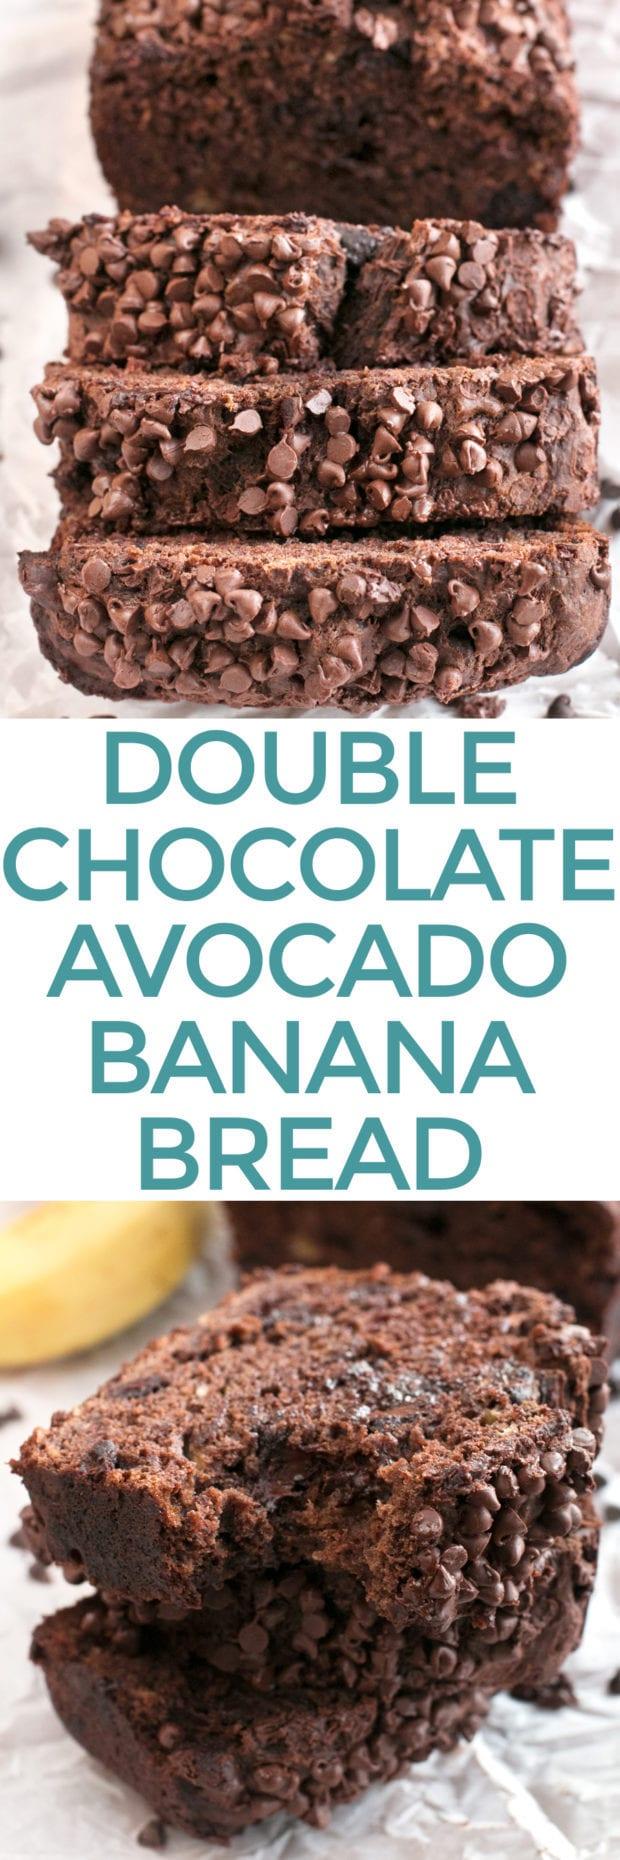 Double Chocolate Avocado Banana Bread Cake N Knife